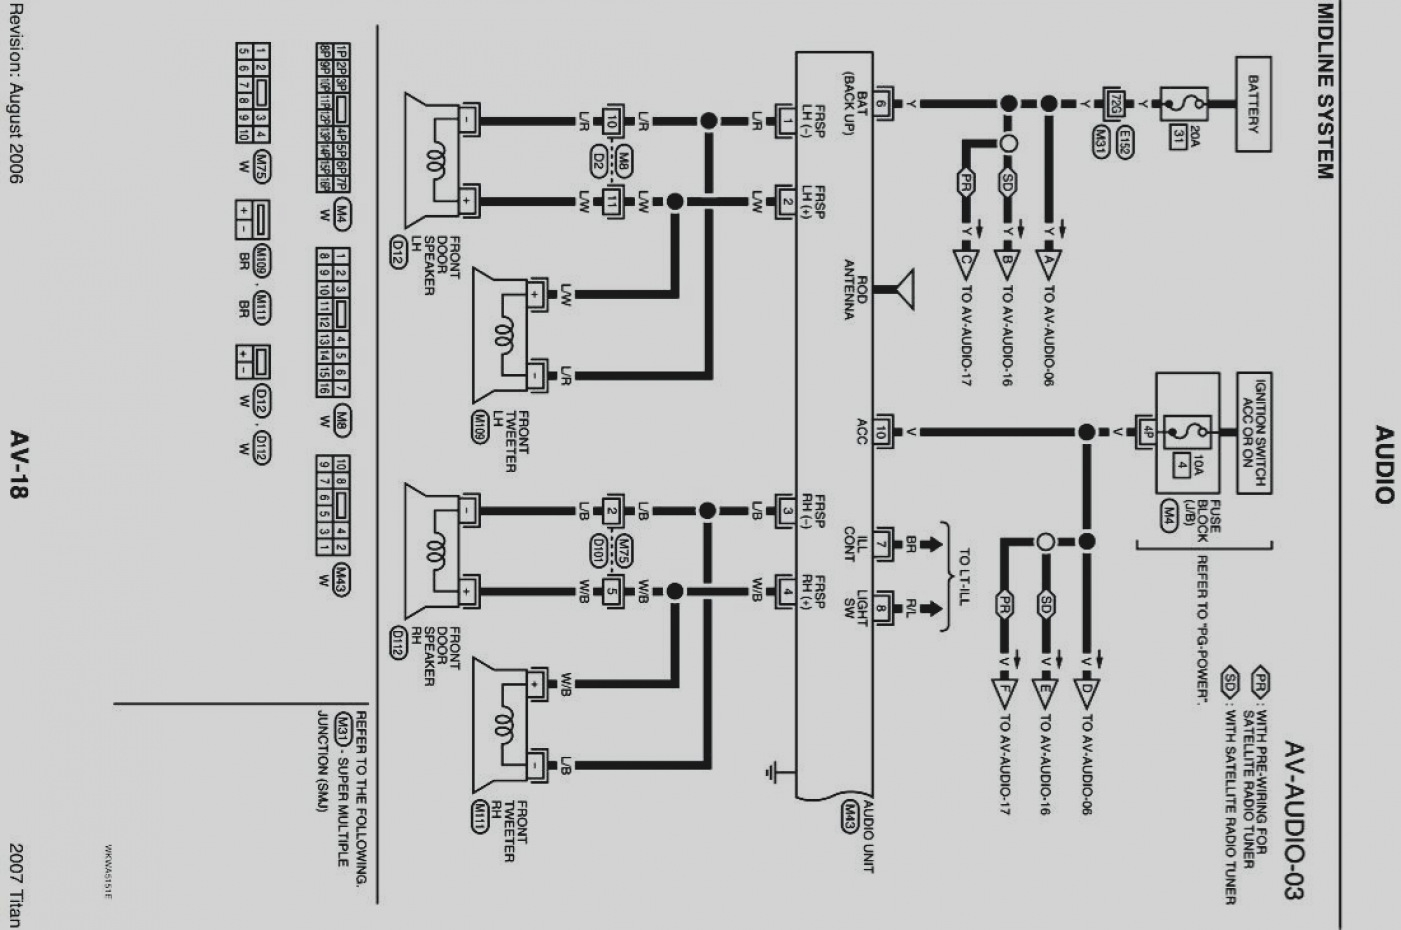 nissan murano alarm wiring diagram 2008 nissan titan alarm wiring